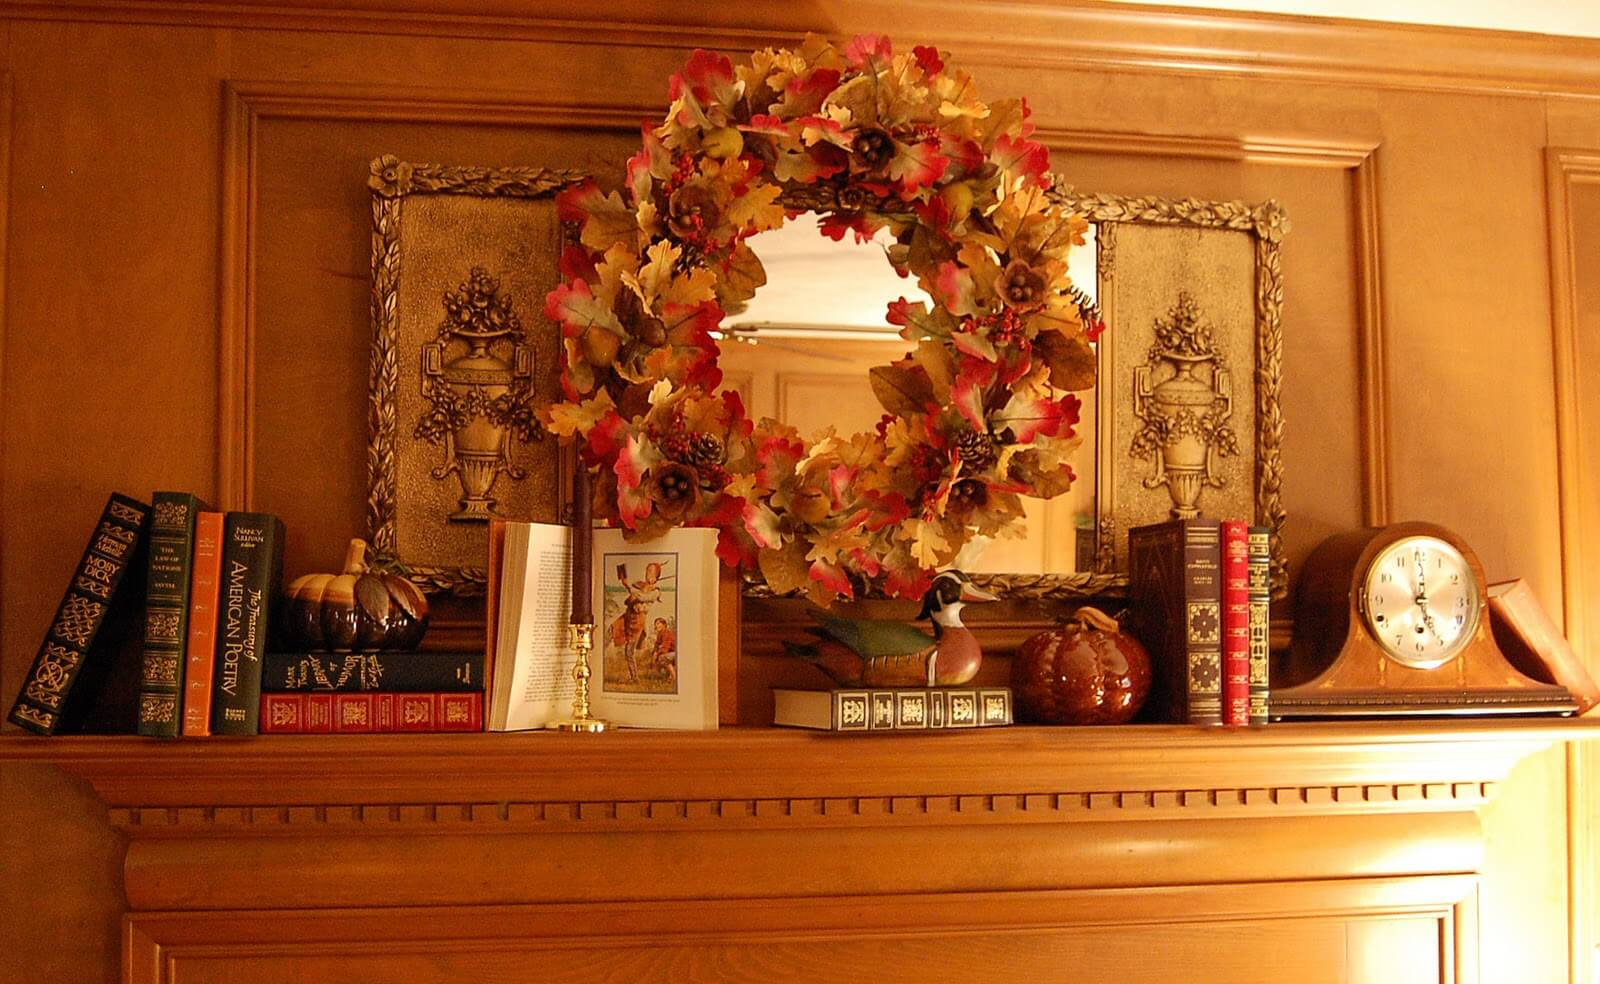 DIY holiday decor around the fireplace mantel